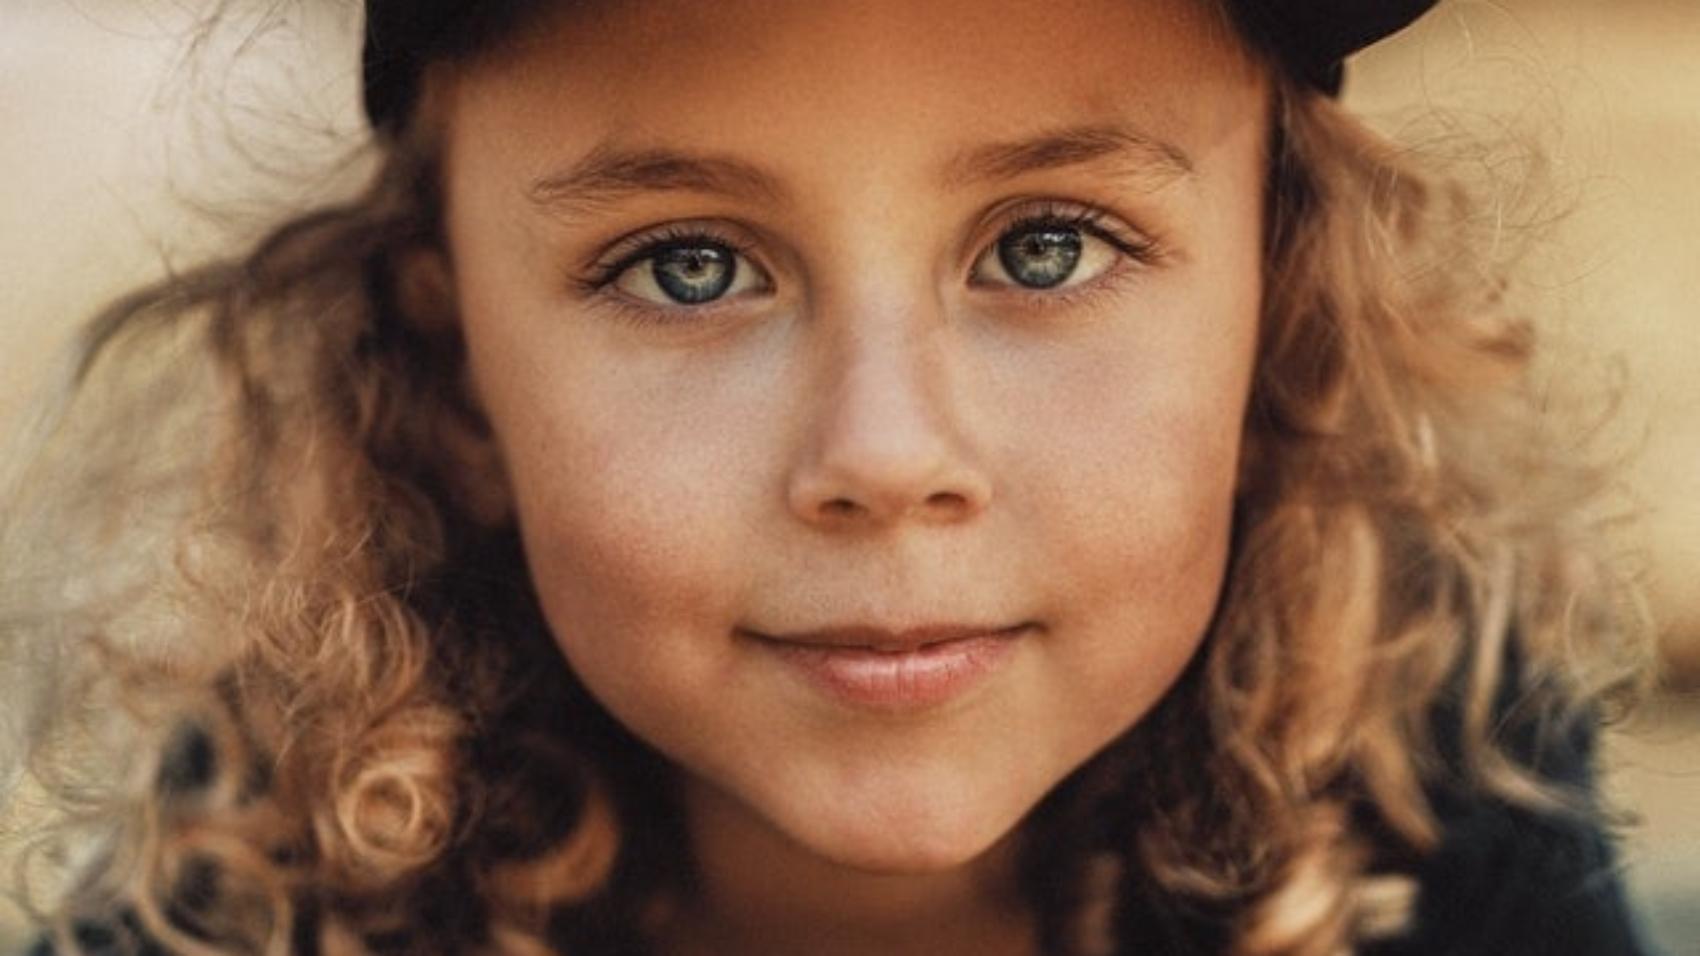 photo-of-girl-smiling-while-wearing-black-cap-4509051